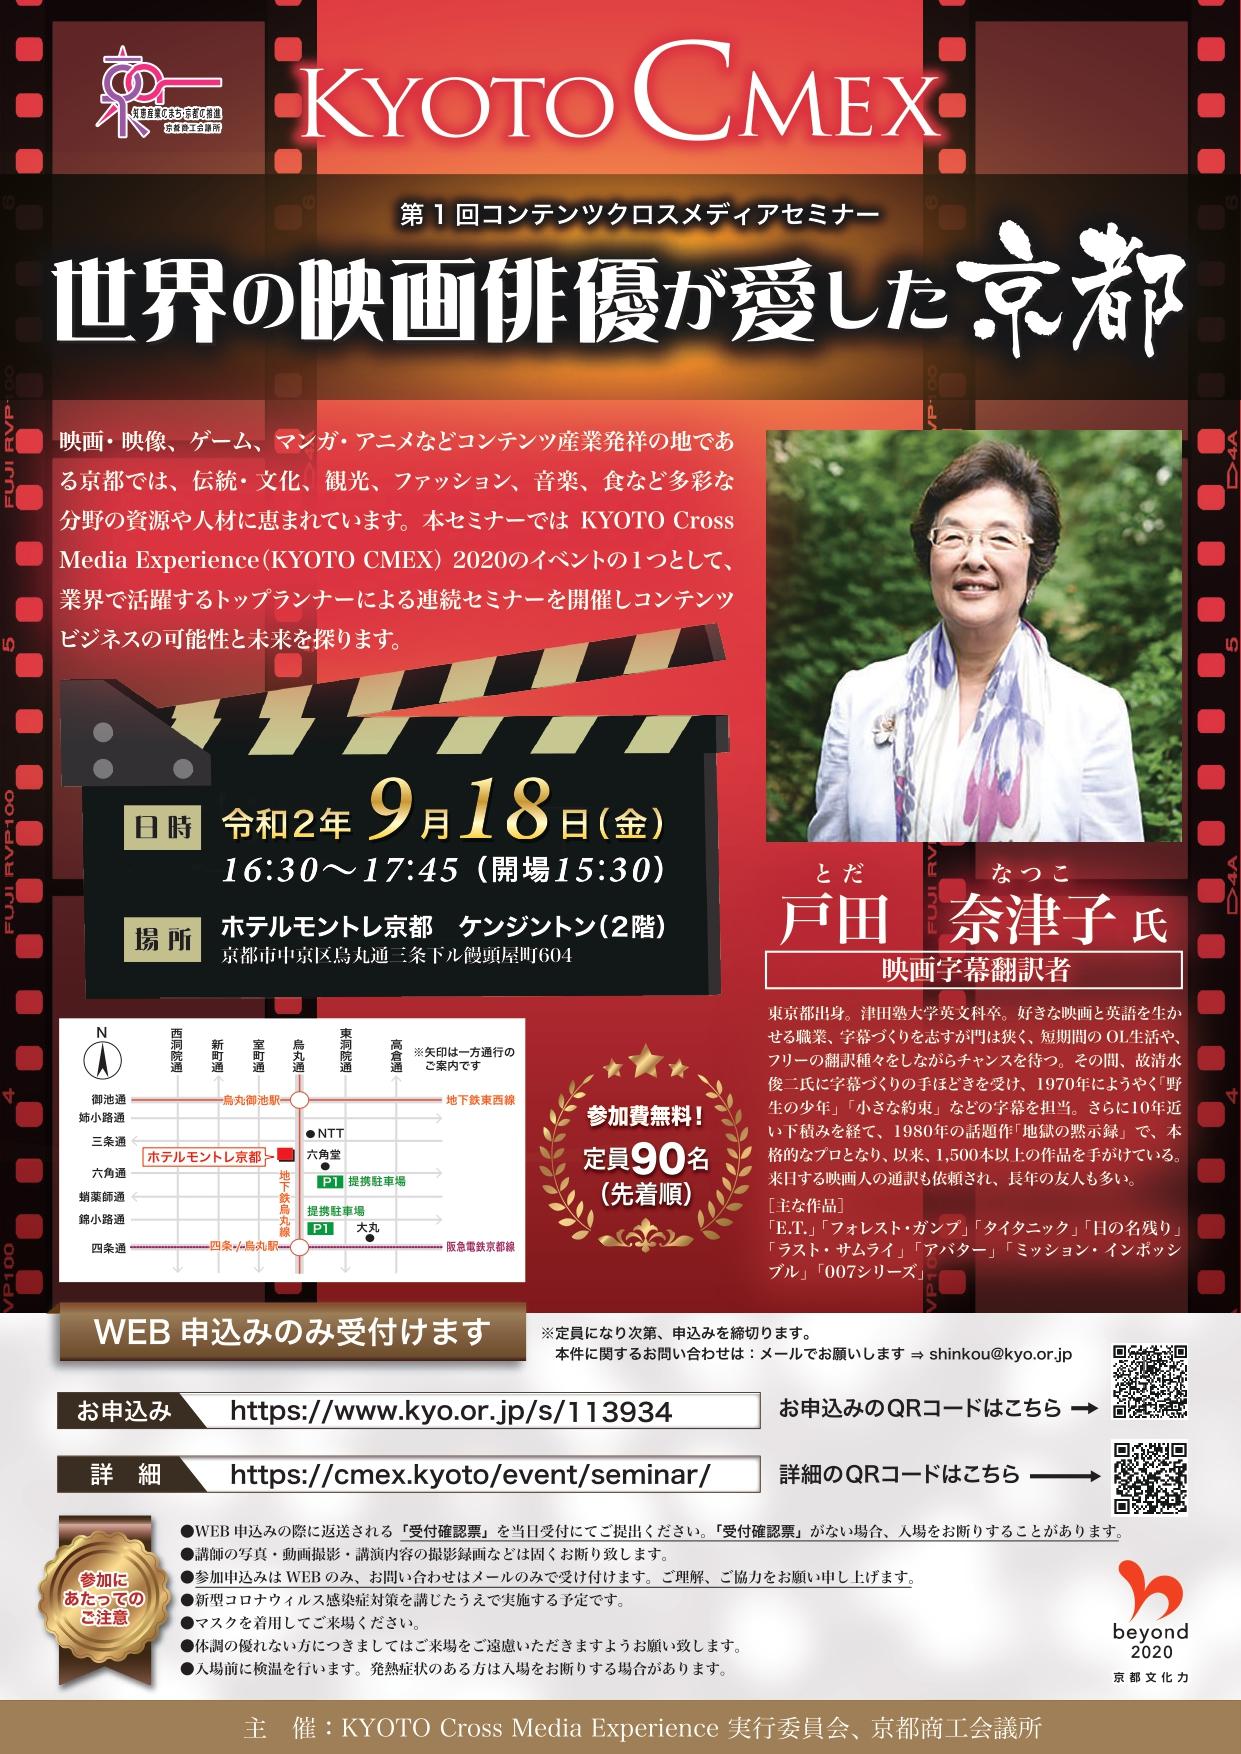 KYOTO CMEX 2020 第1回コンテンツクロスメディアセミナー